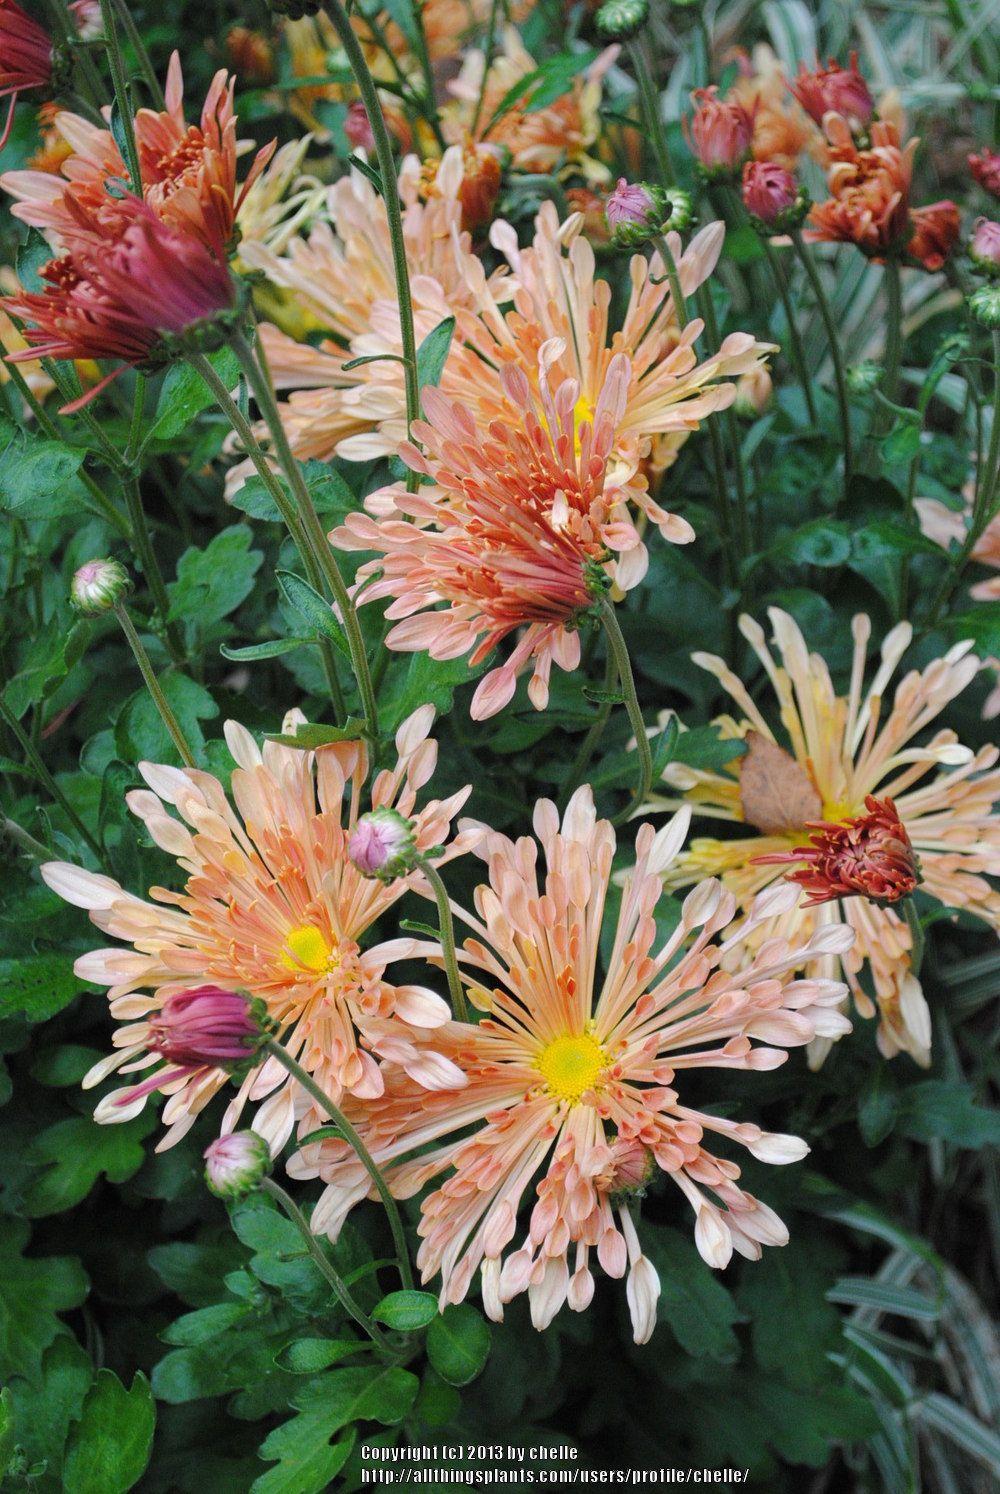 Chrysanthemum Peach Centerpiece Chrysanthemum Beautiful Flowers Pretty Flowers